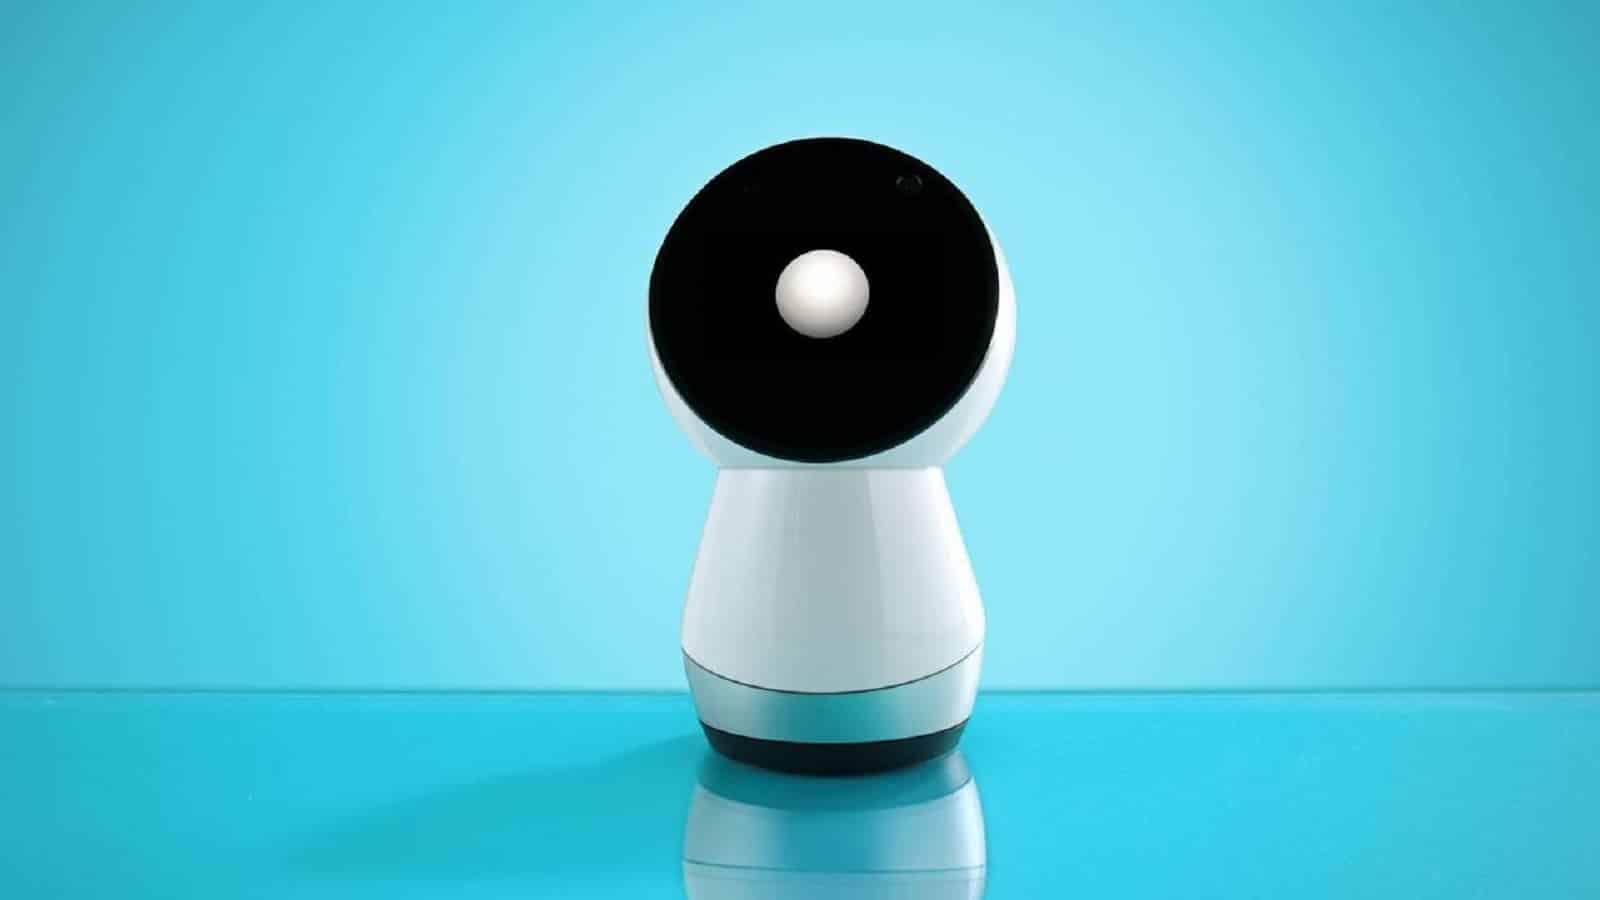 jibo robot on blue background